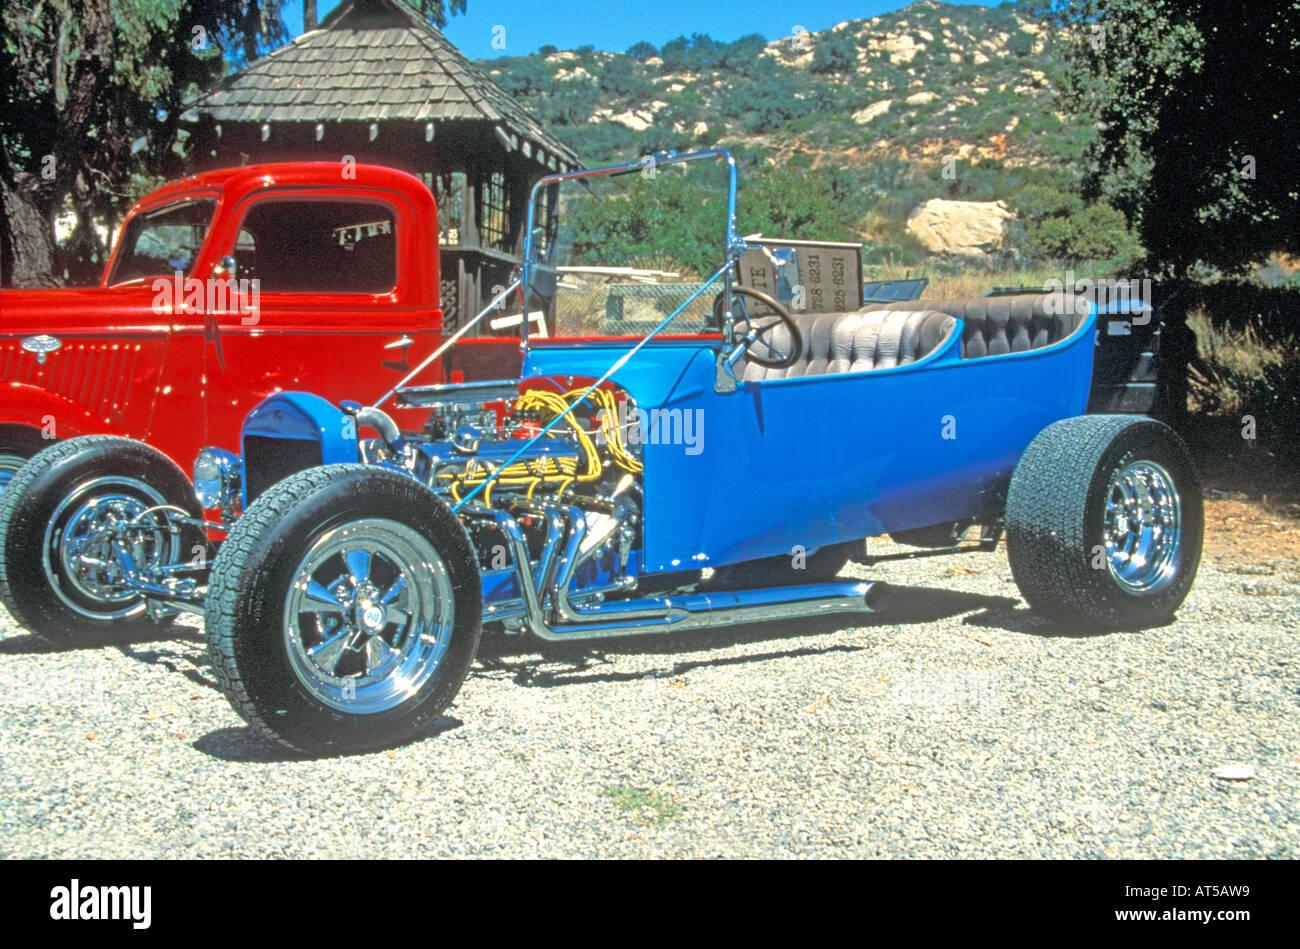 Blue V8 open top hot rod Stock Photo: 9261336 - Alamy